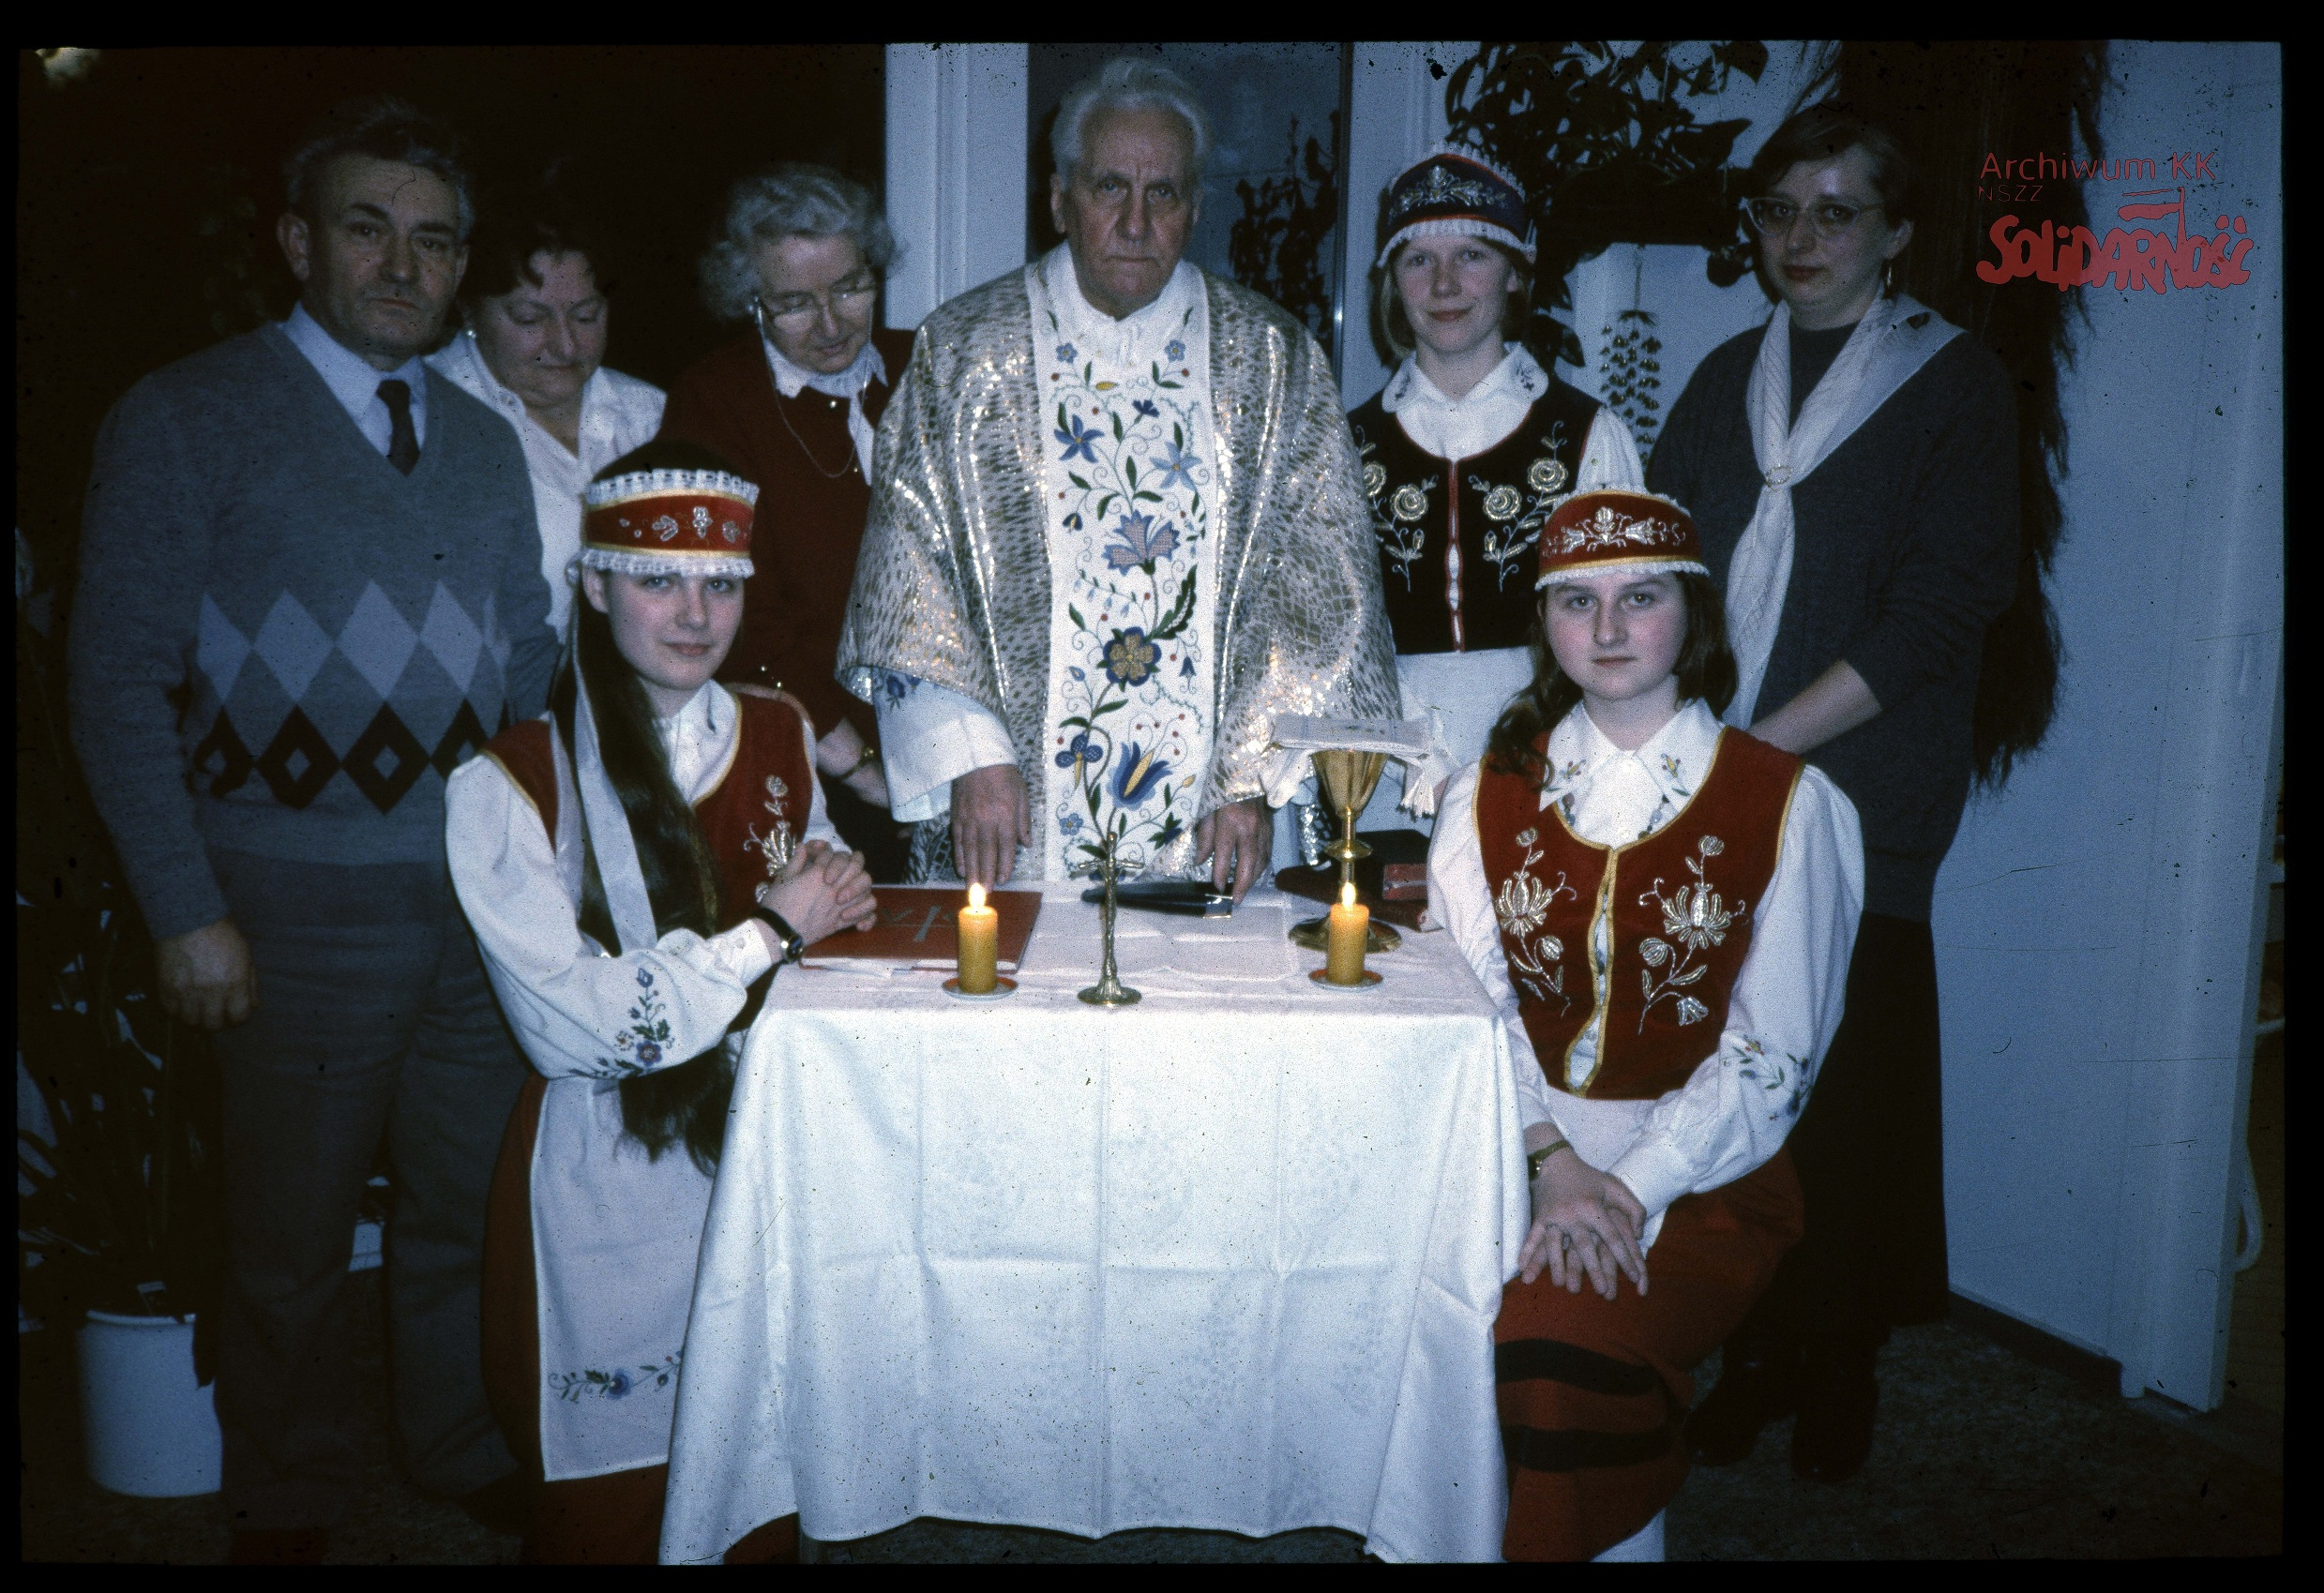 AKKS-347-79-119-004-B  Priest Prelate Hilary Jastak